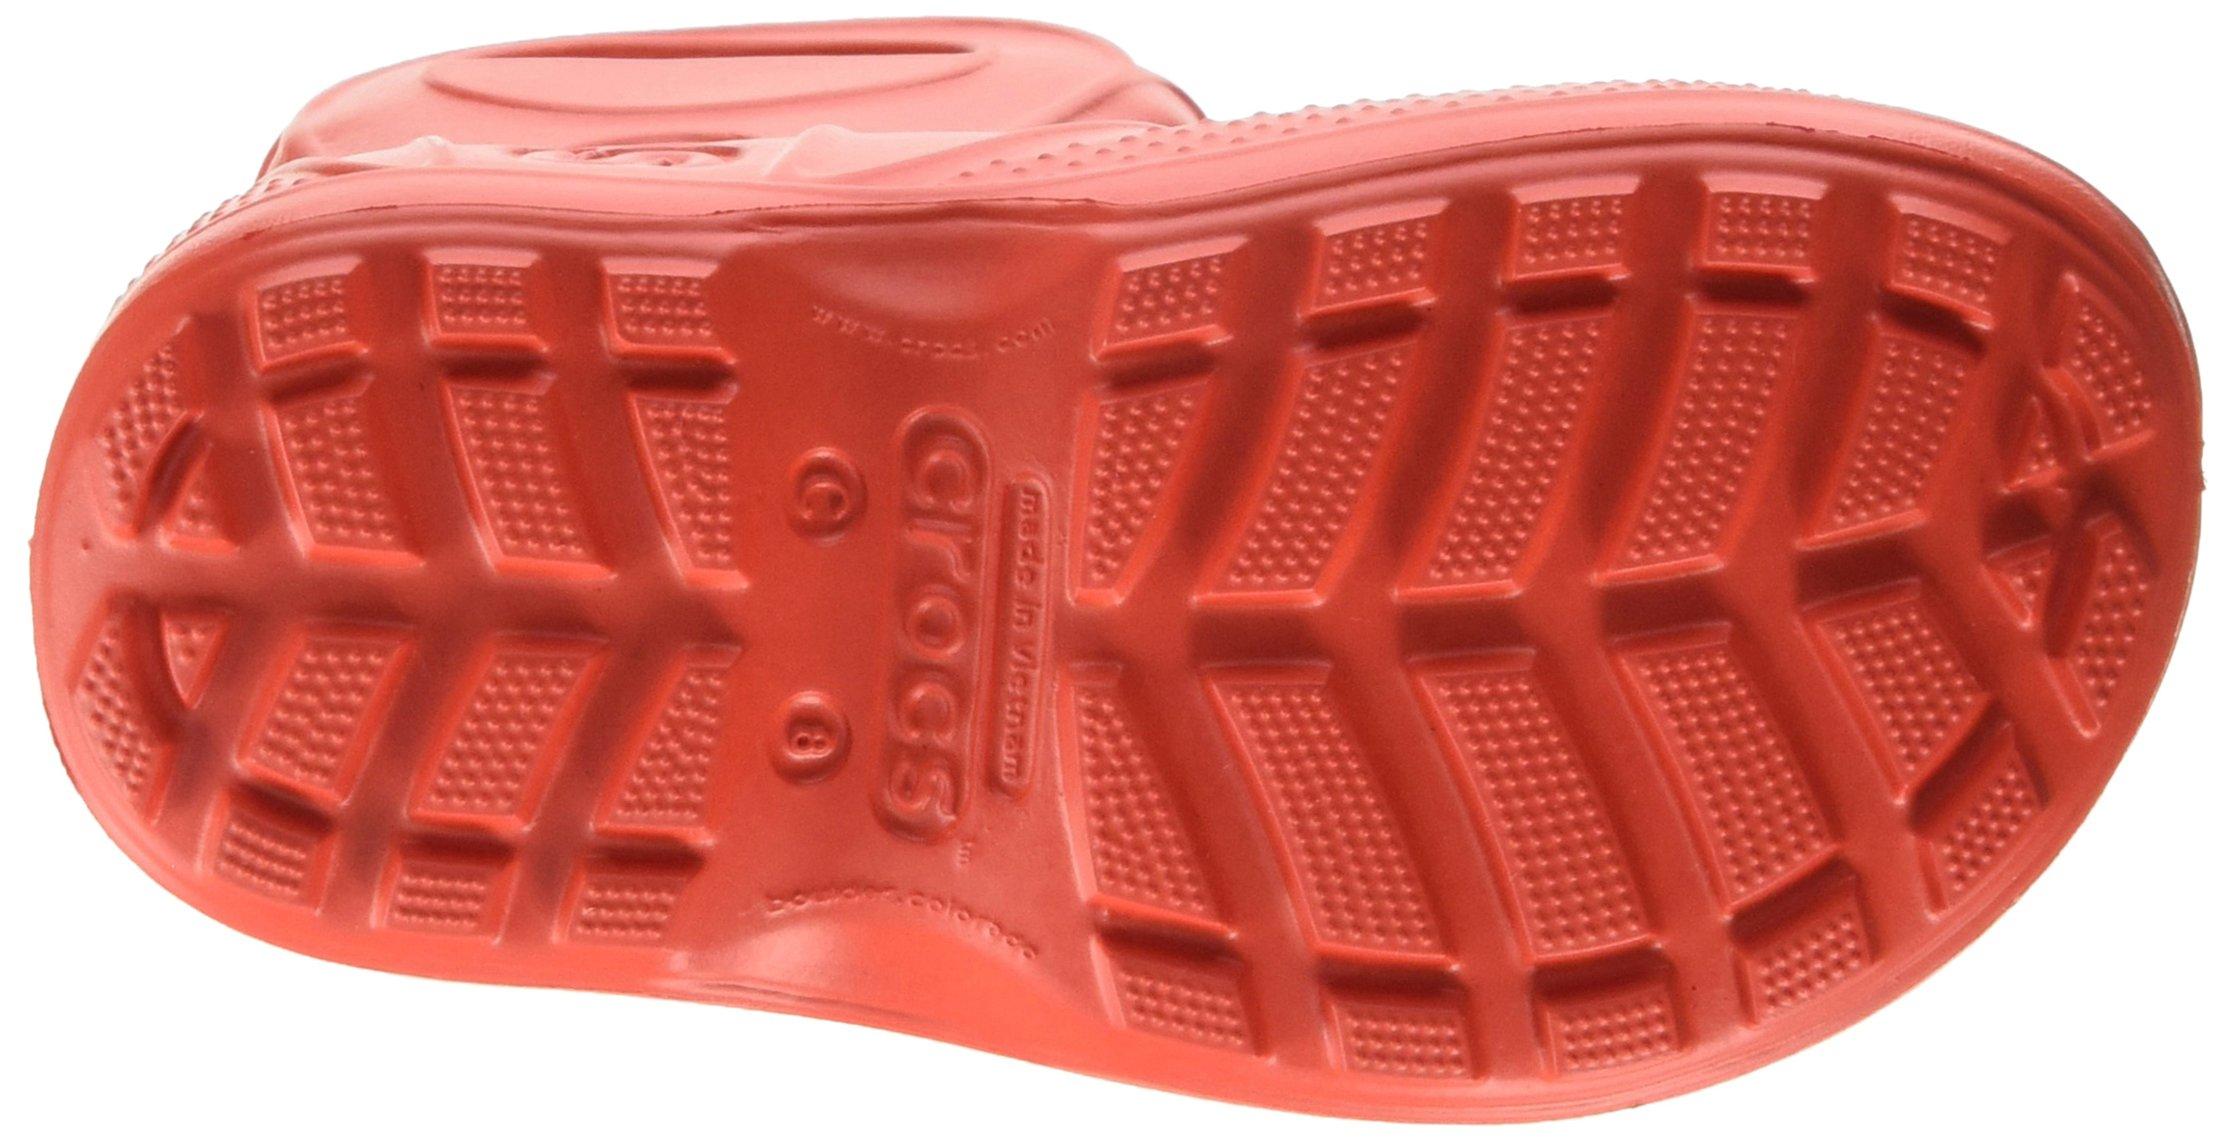 Crocs Kids' Handle It Rain Boot, Flame, 8 M US Toddler by Crocs (Image #3)